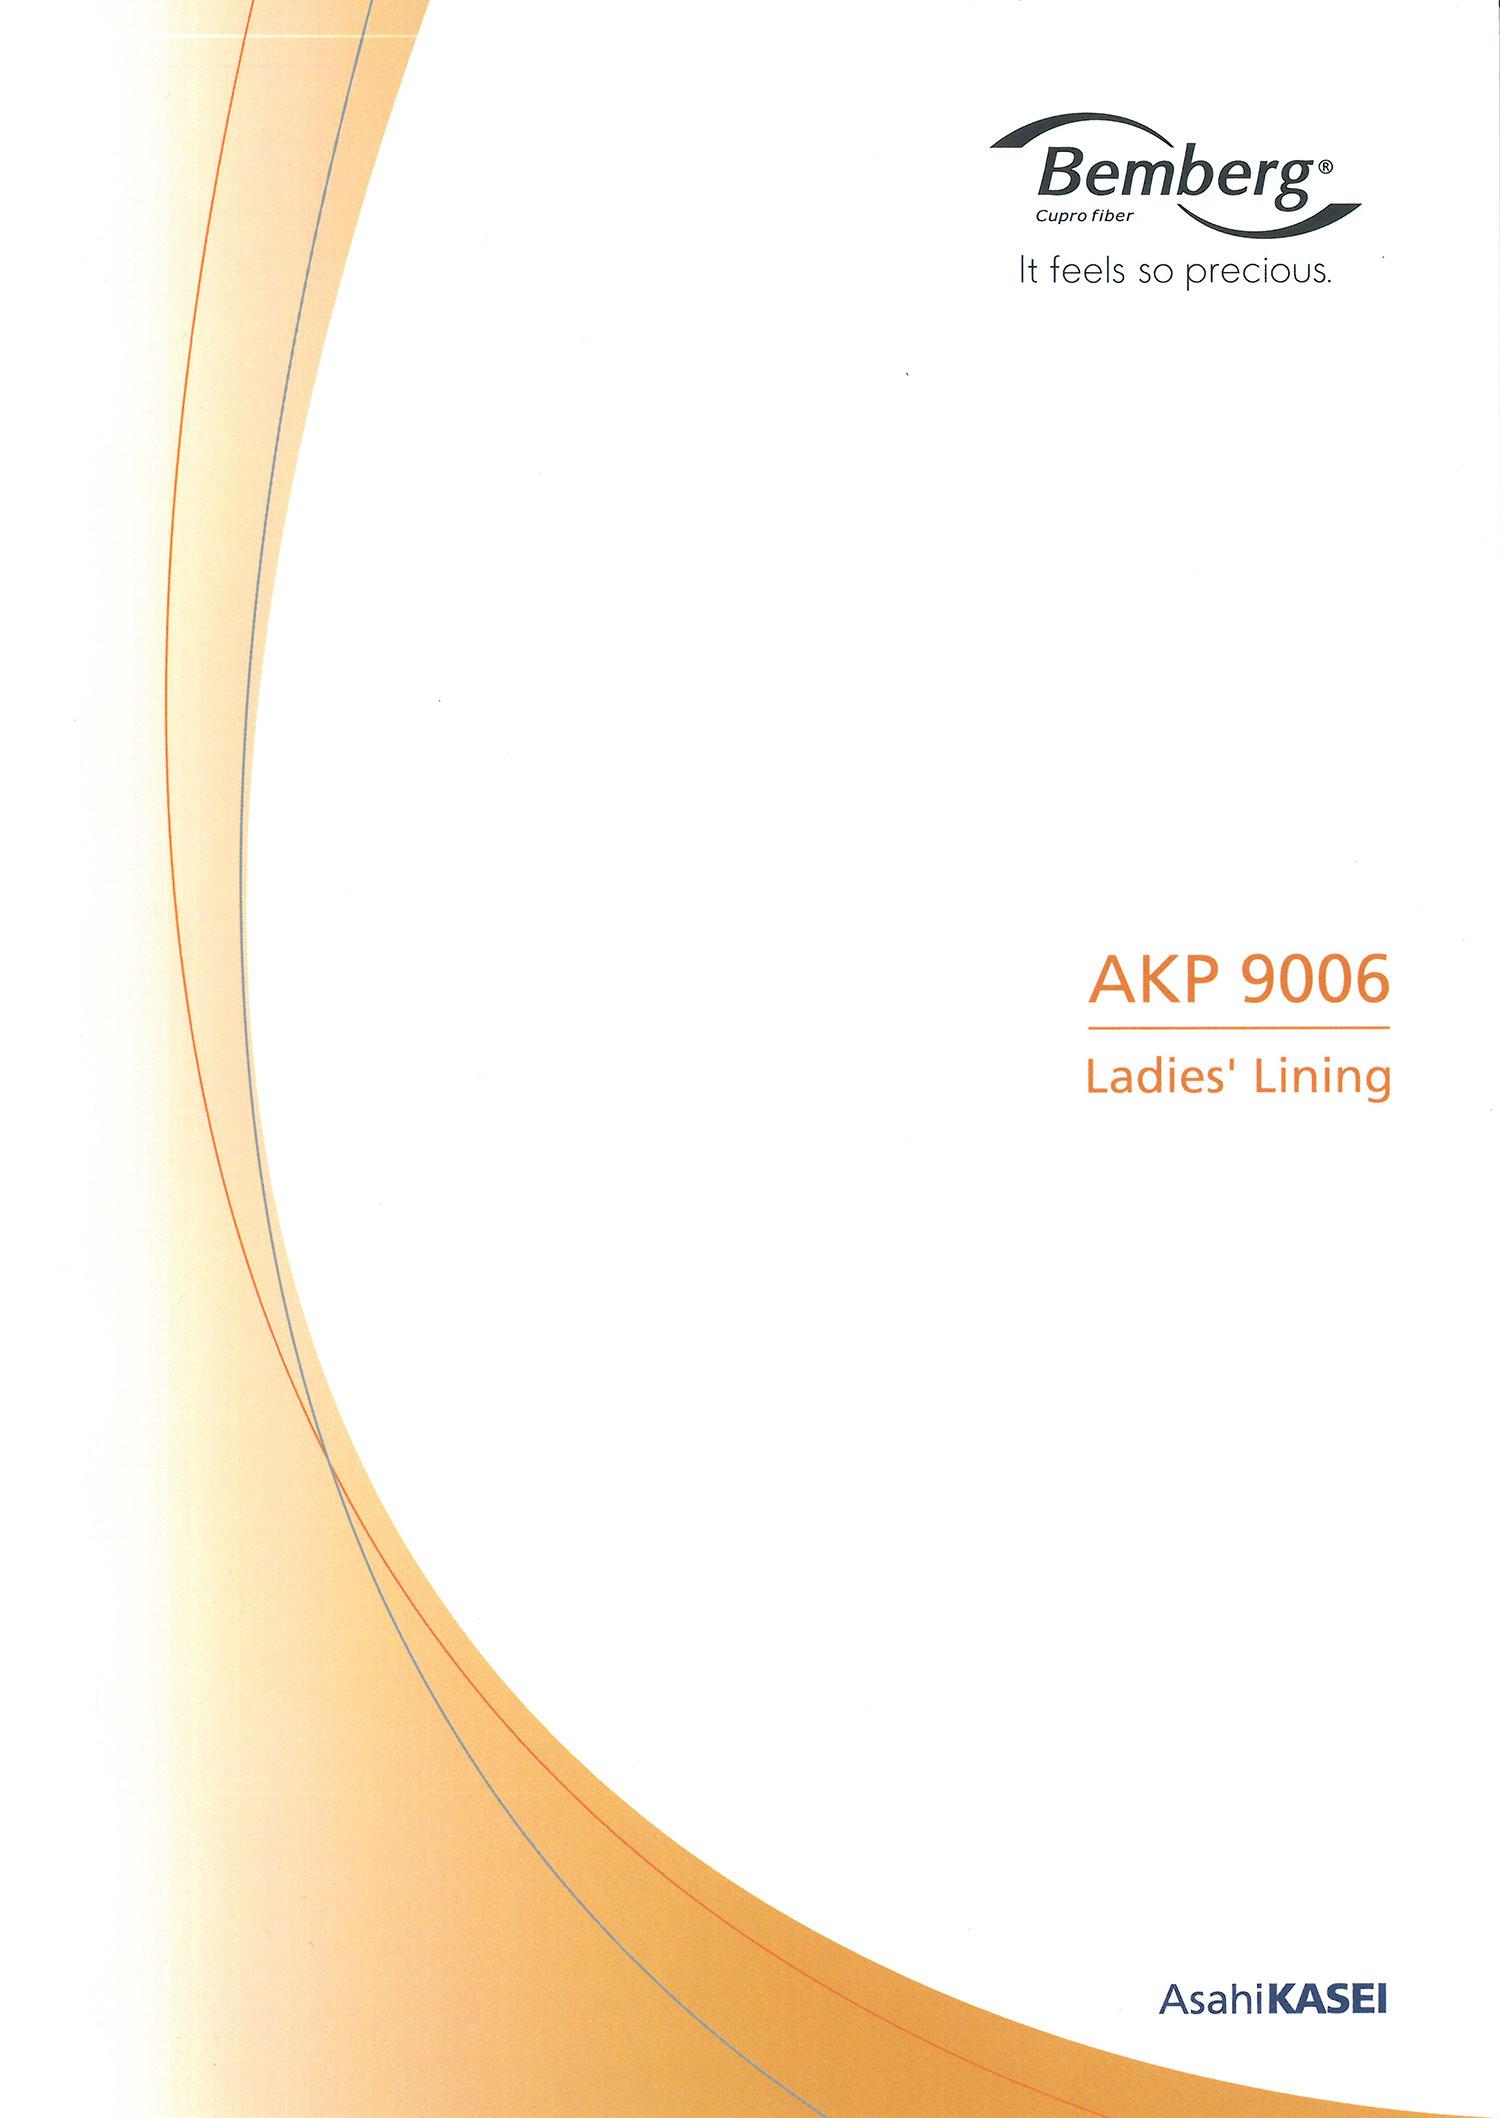 AKP9006 ベンベルグ裏地 ラグジュール 旭化成/オークラ商事 - ApparelX アパレル資材卸通販